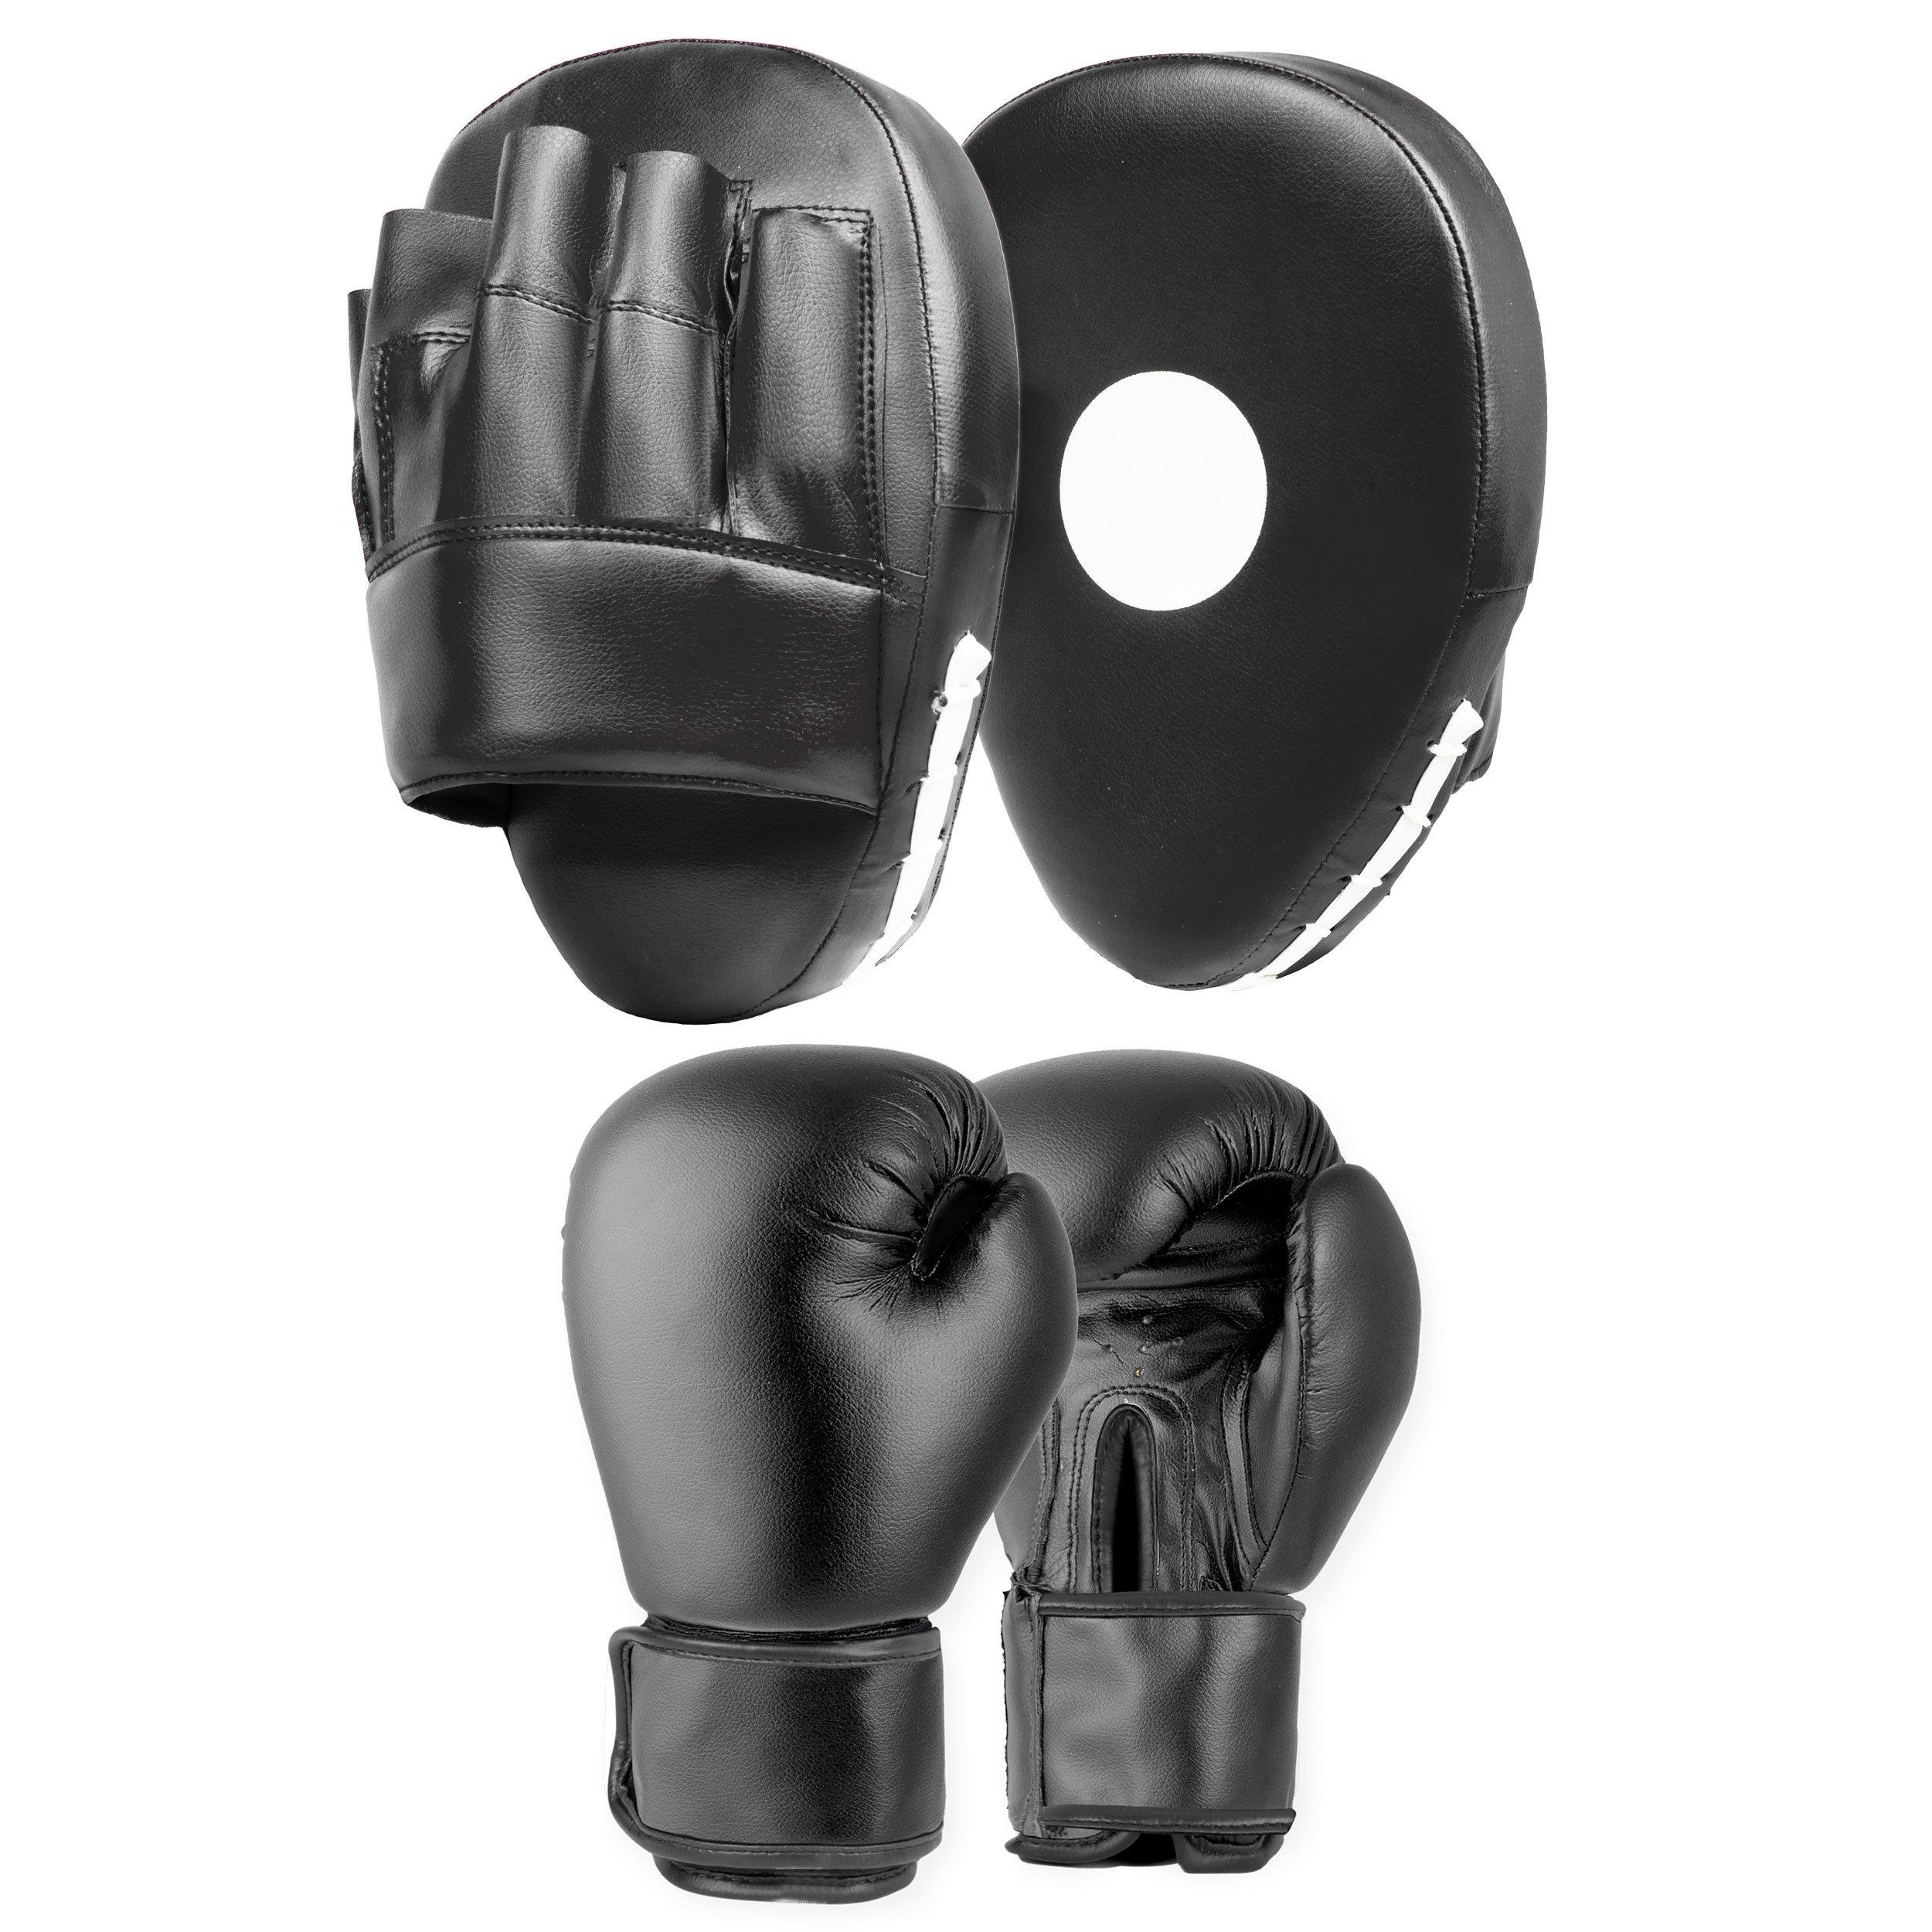 Boxing Gloves Set Focus Pad Set Boxing Gloves For Martial Arts Punch Bag Gloves Punch Pads Boxing Pads Sparring Gloves Boxing Training Gloves